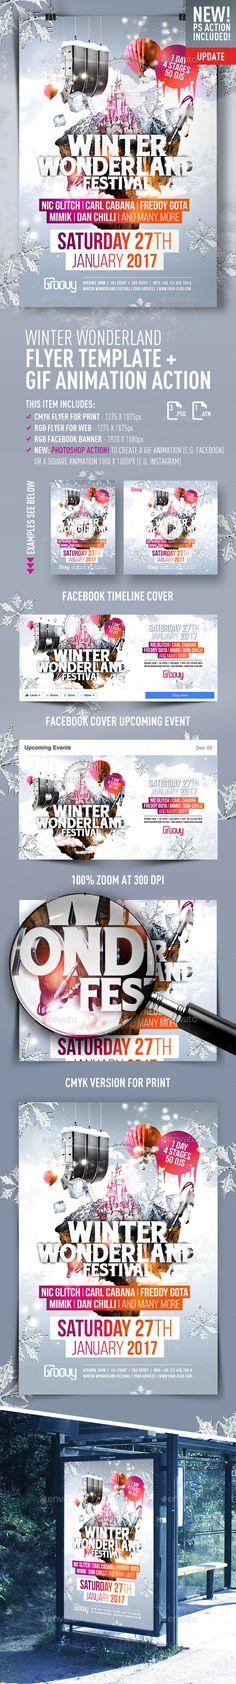 Winter Wonderland Festival  + GIF Animation Action